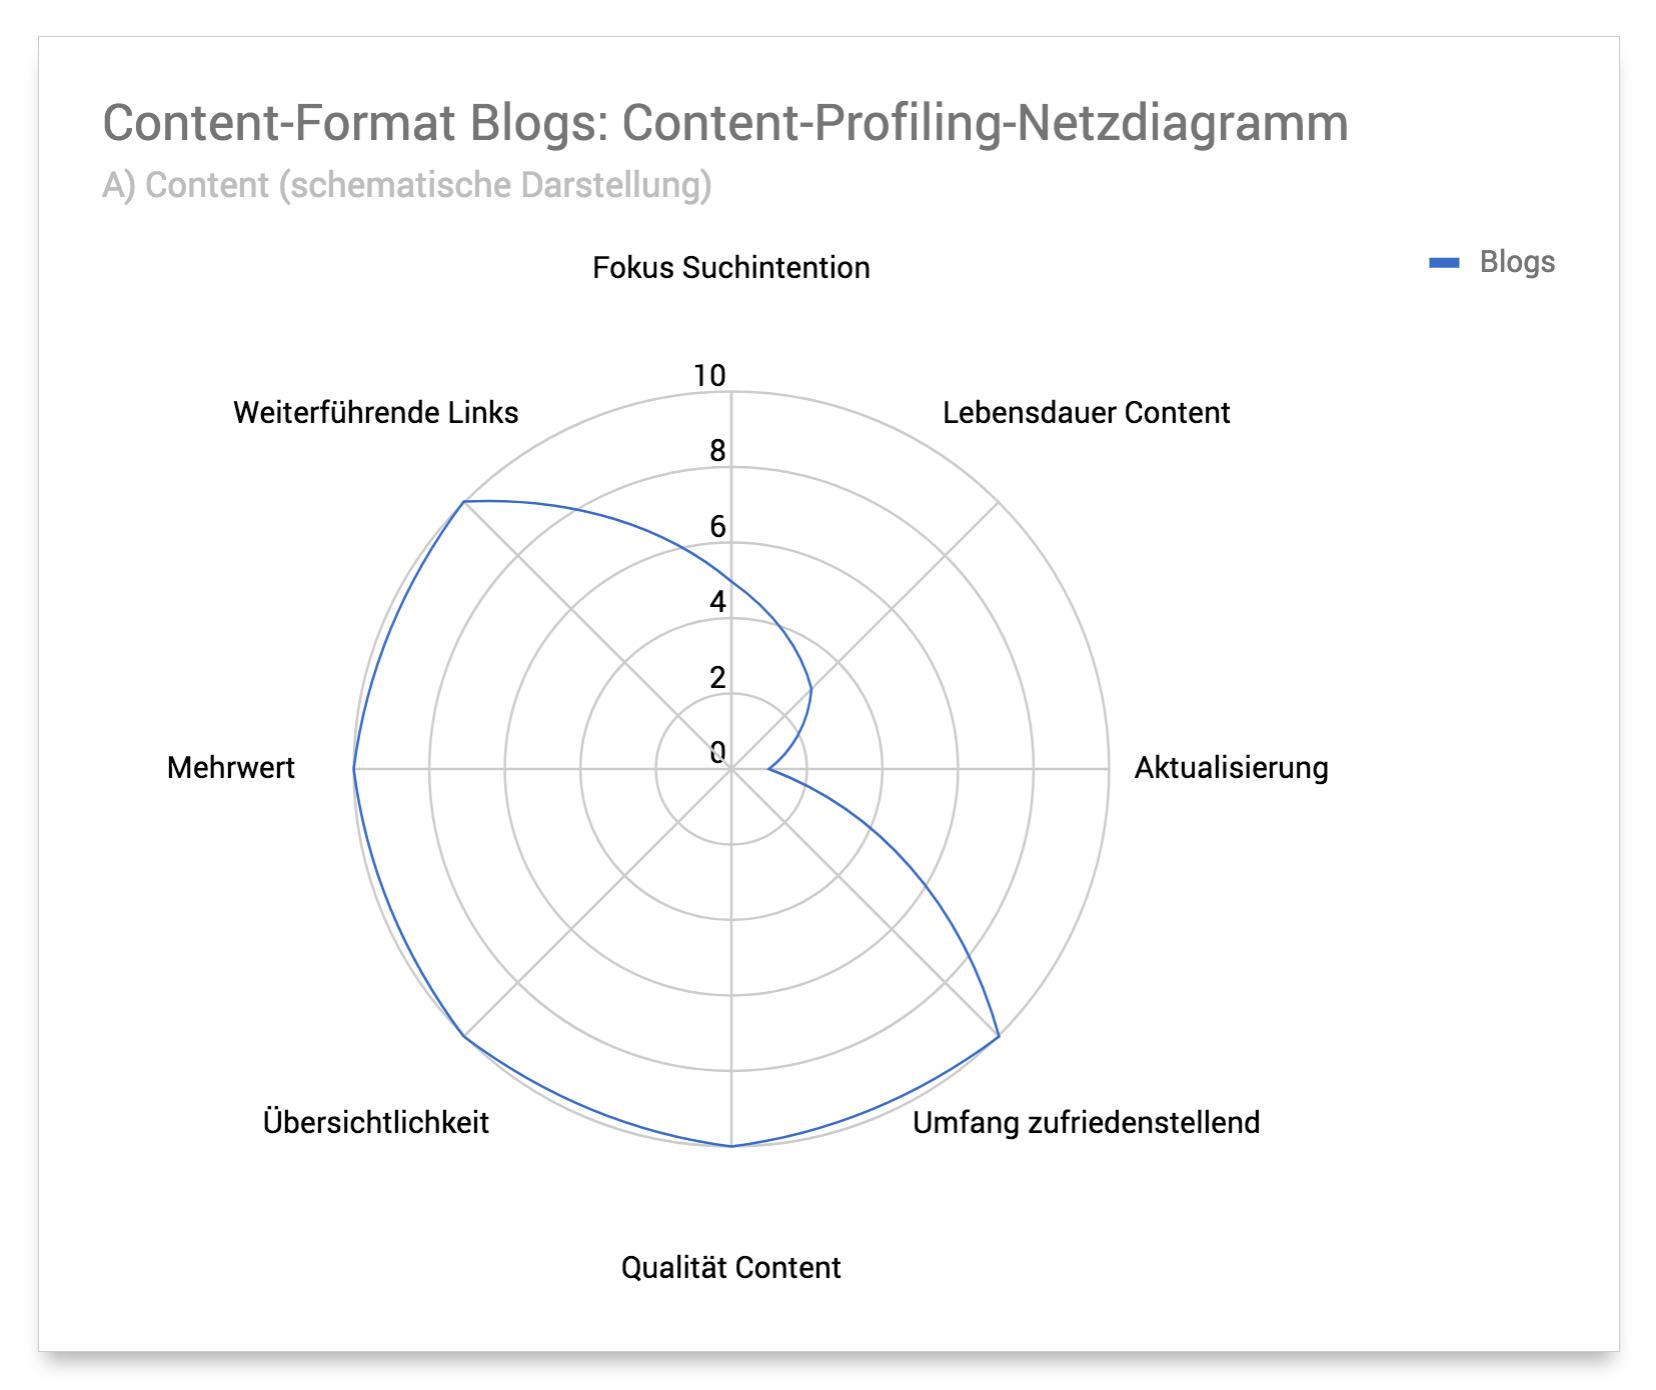 Netzdiagramm Content-Format Blogs